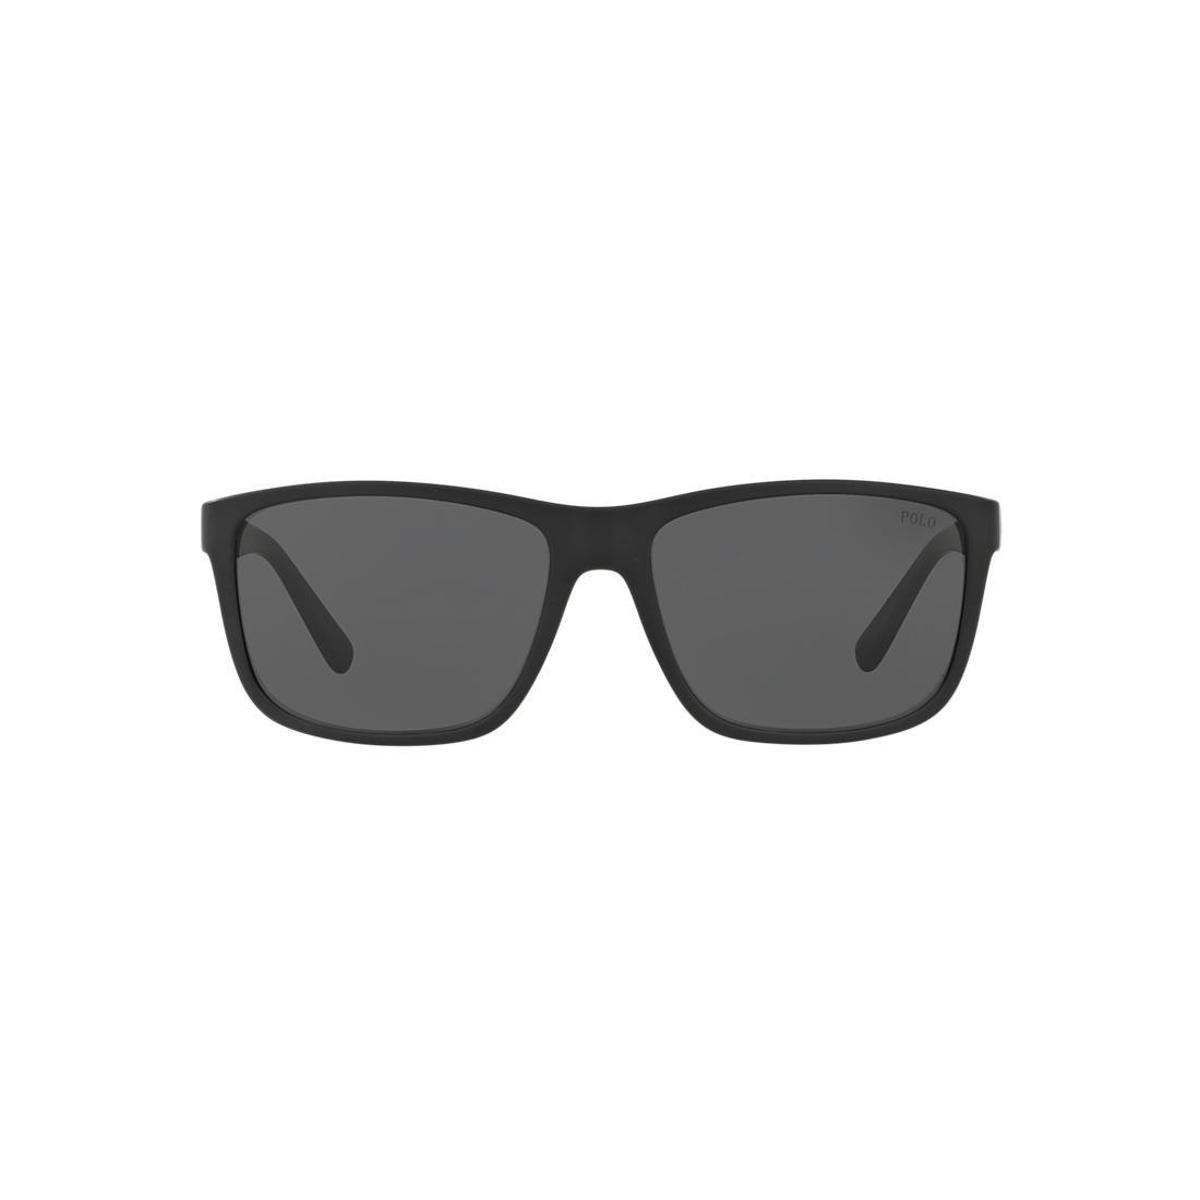 52f5c7e70785c Oculos Polo Ralph Lauren Masculino Preço - Prism Contractors   Engineers